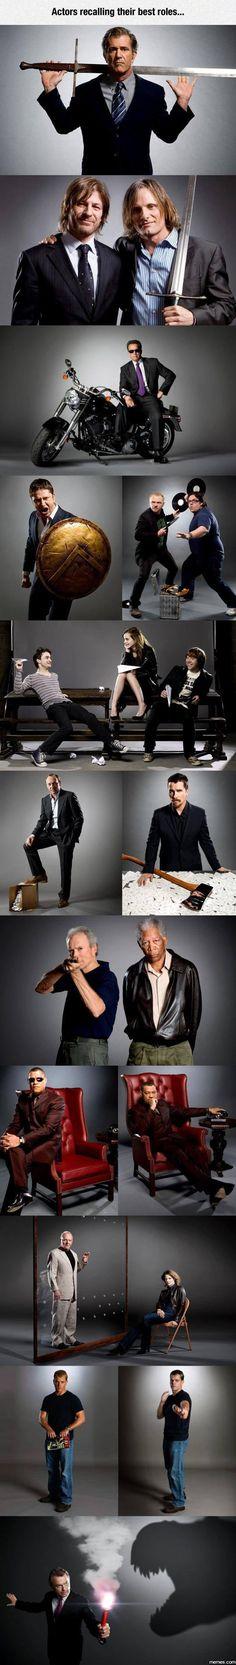 Actors Recalling Their Best Roles   Memes.com